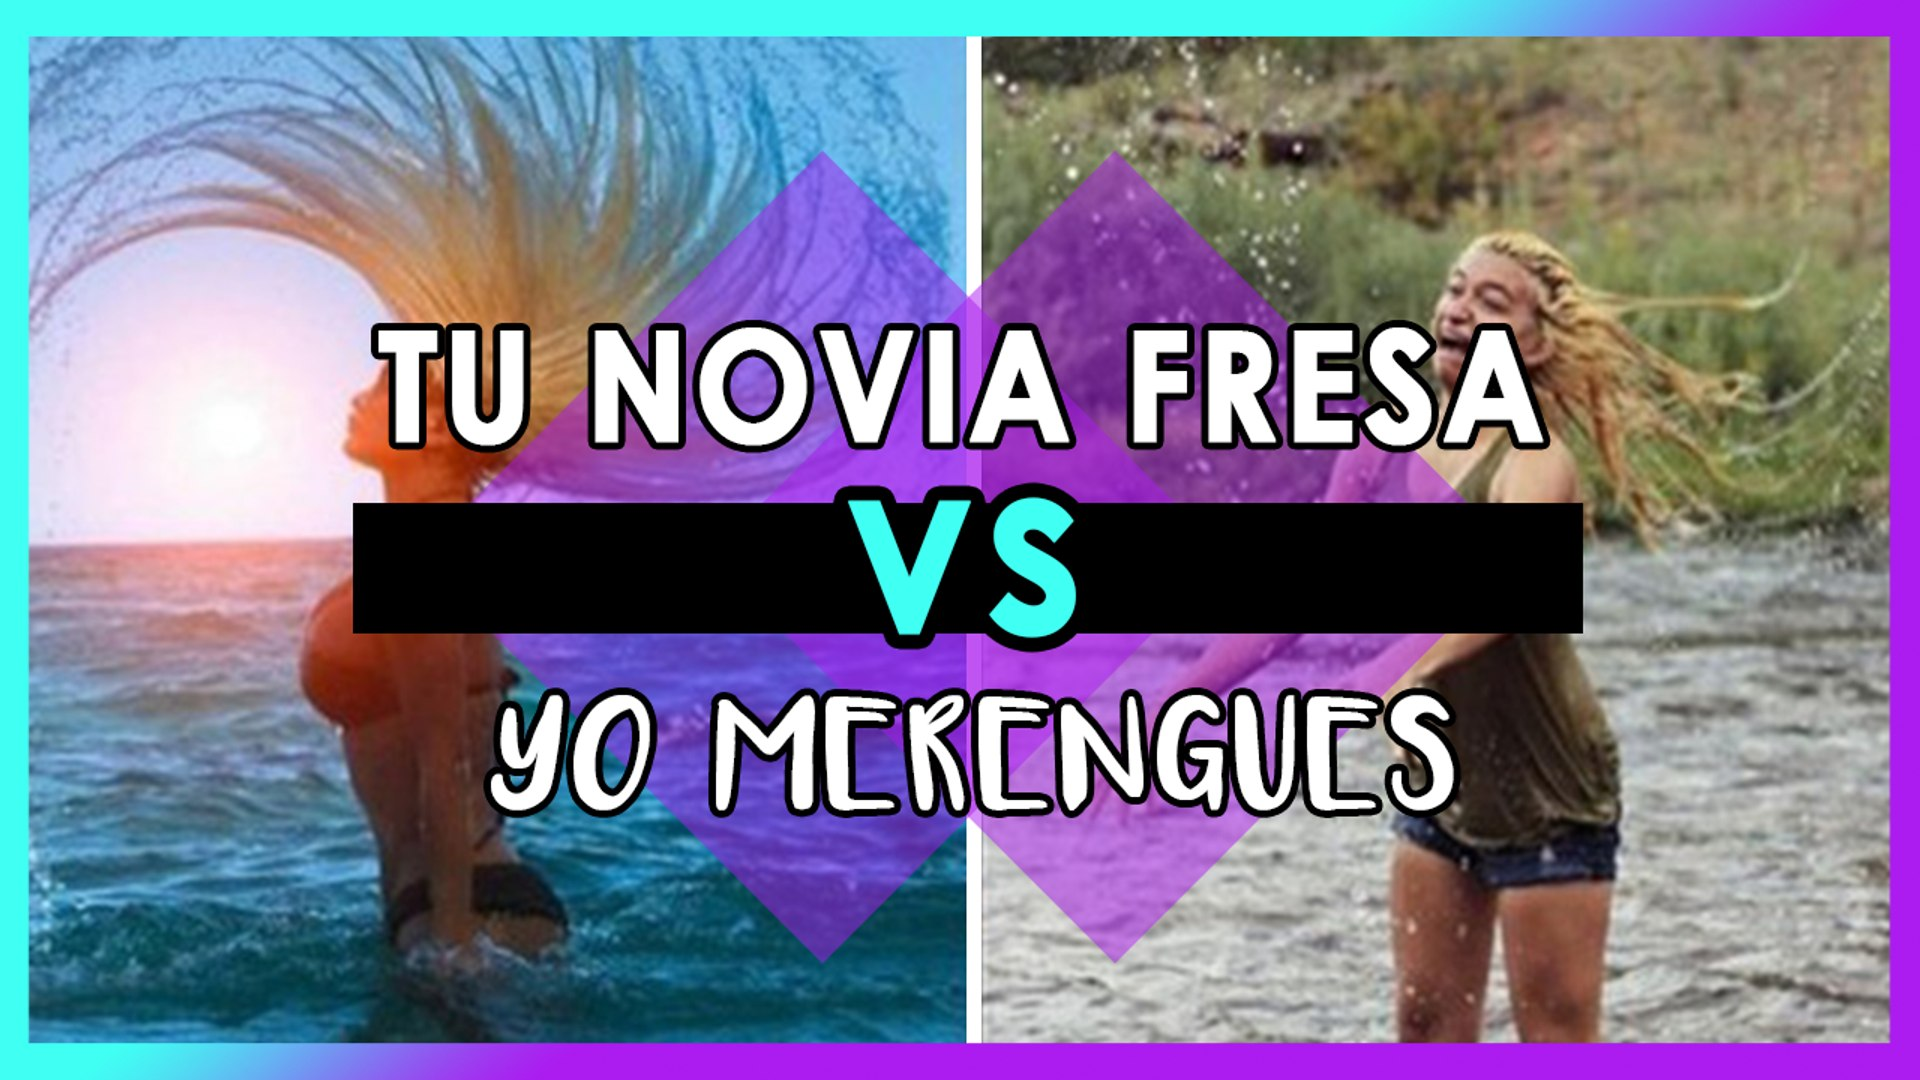 TU NOVIA FRESA VS YO MERENGUES - Vídeo Dailymotion